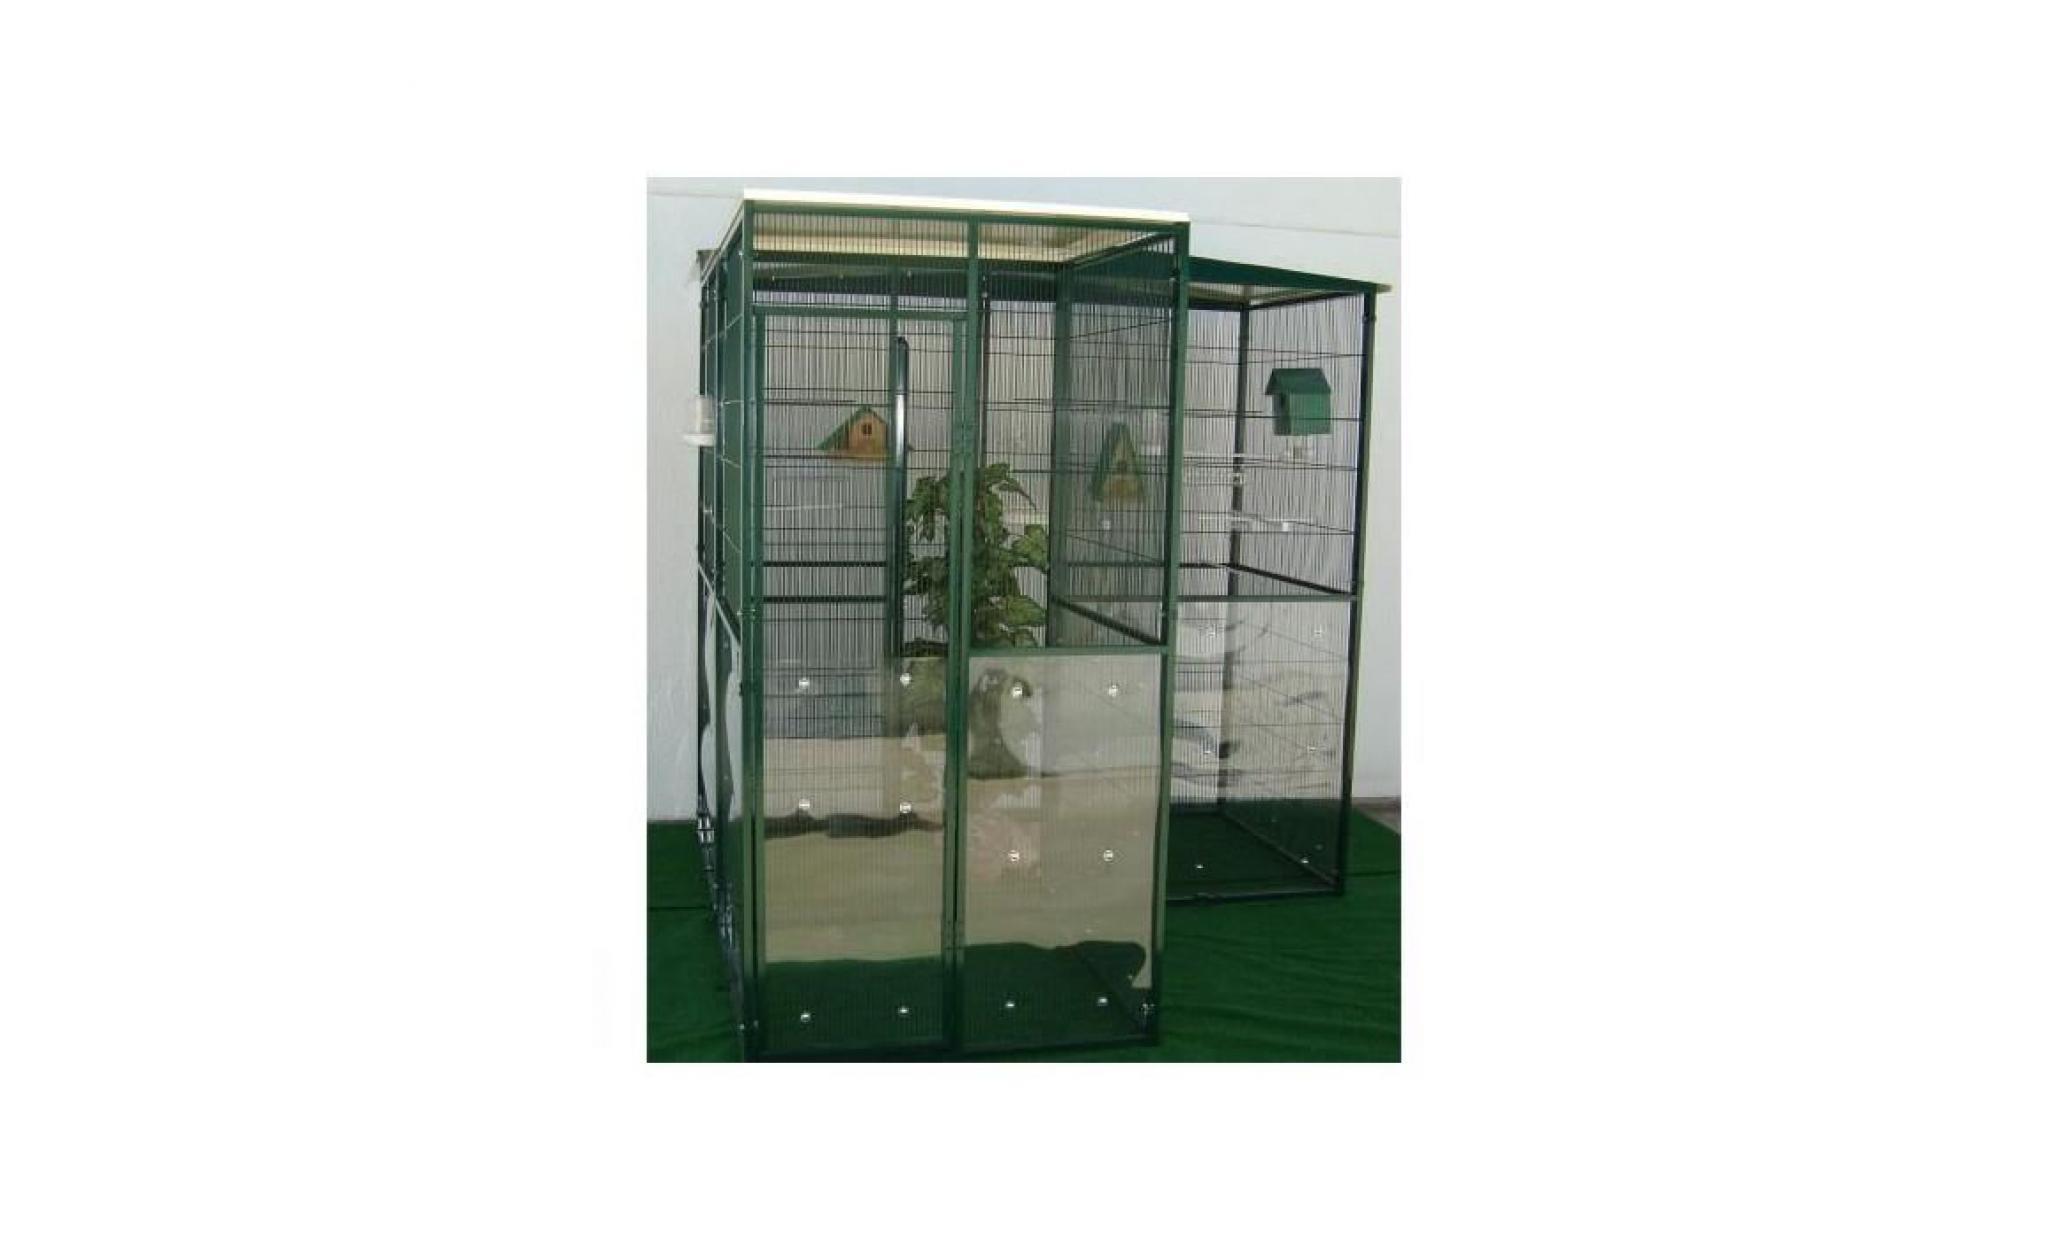 Voliere De Jardin 3M² Avec Cage De Securite 1M² destiné Voliere De Jardin